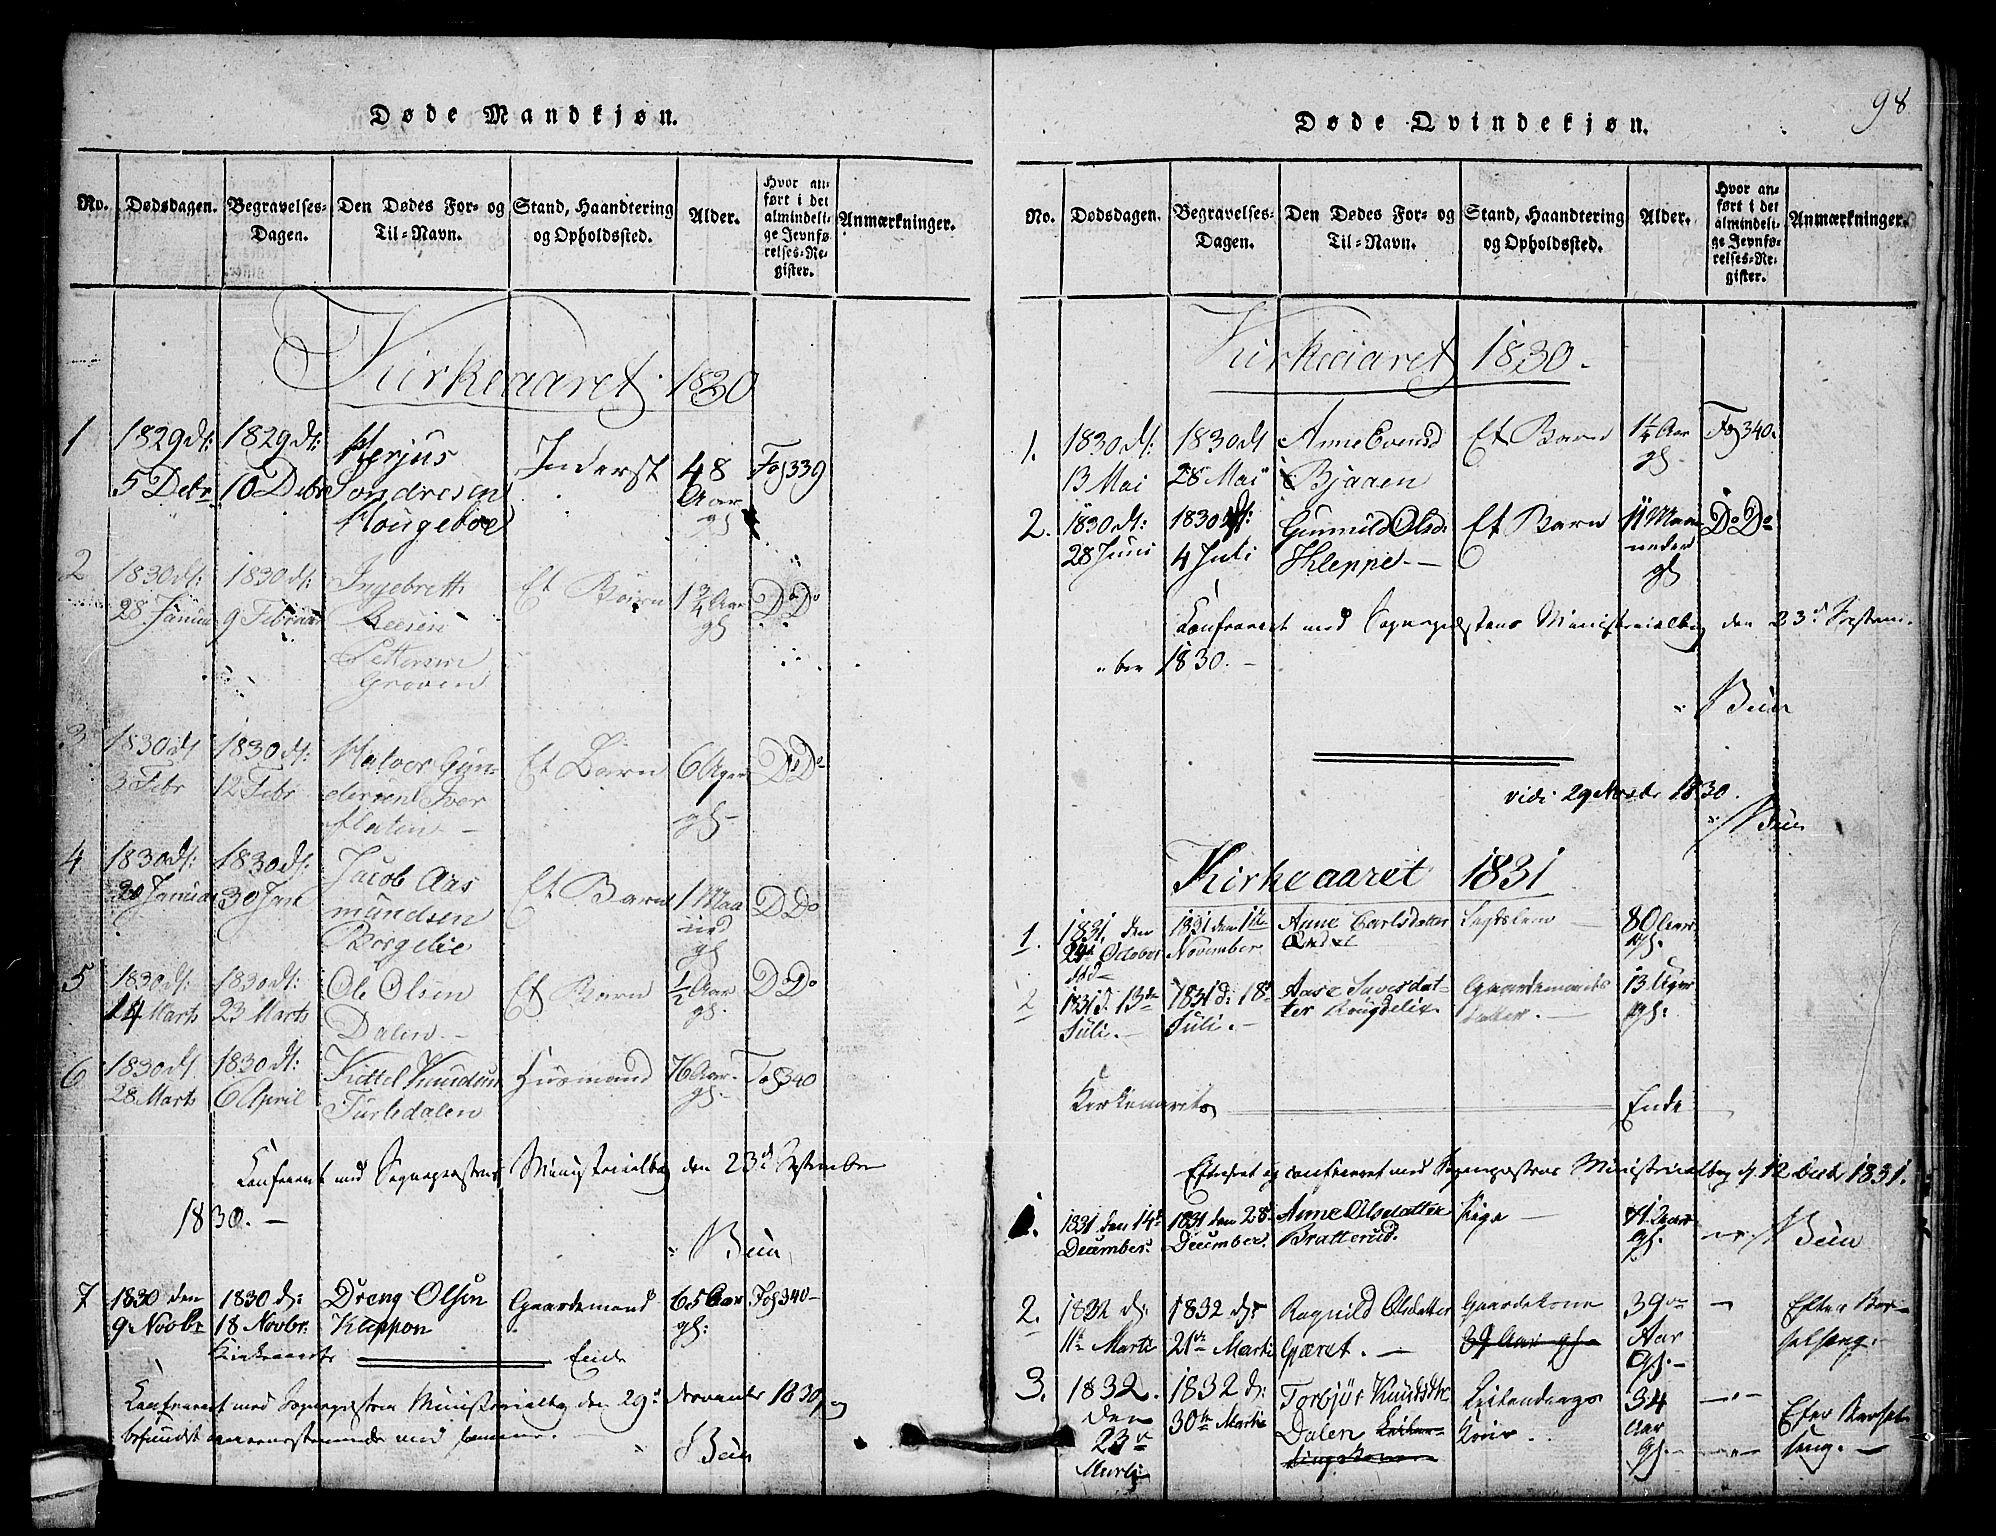 SAKO, Lårdal kirkebøker, G/Gb/L0001: Klokkerbok nr. II 1, 1815-1865, s. 98